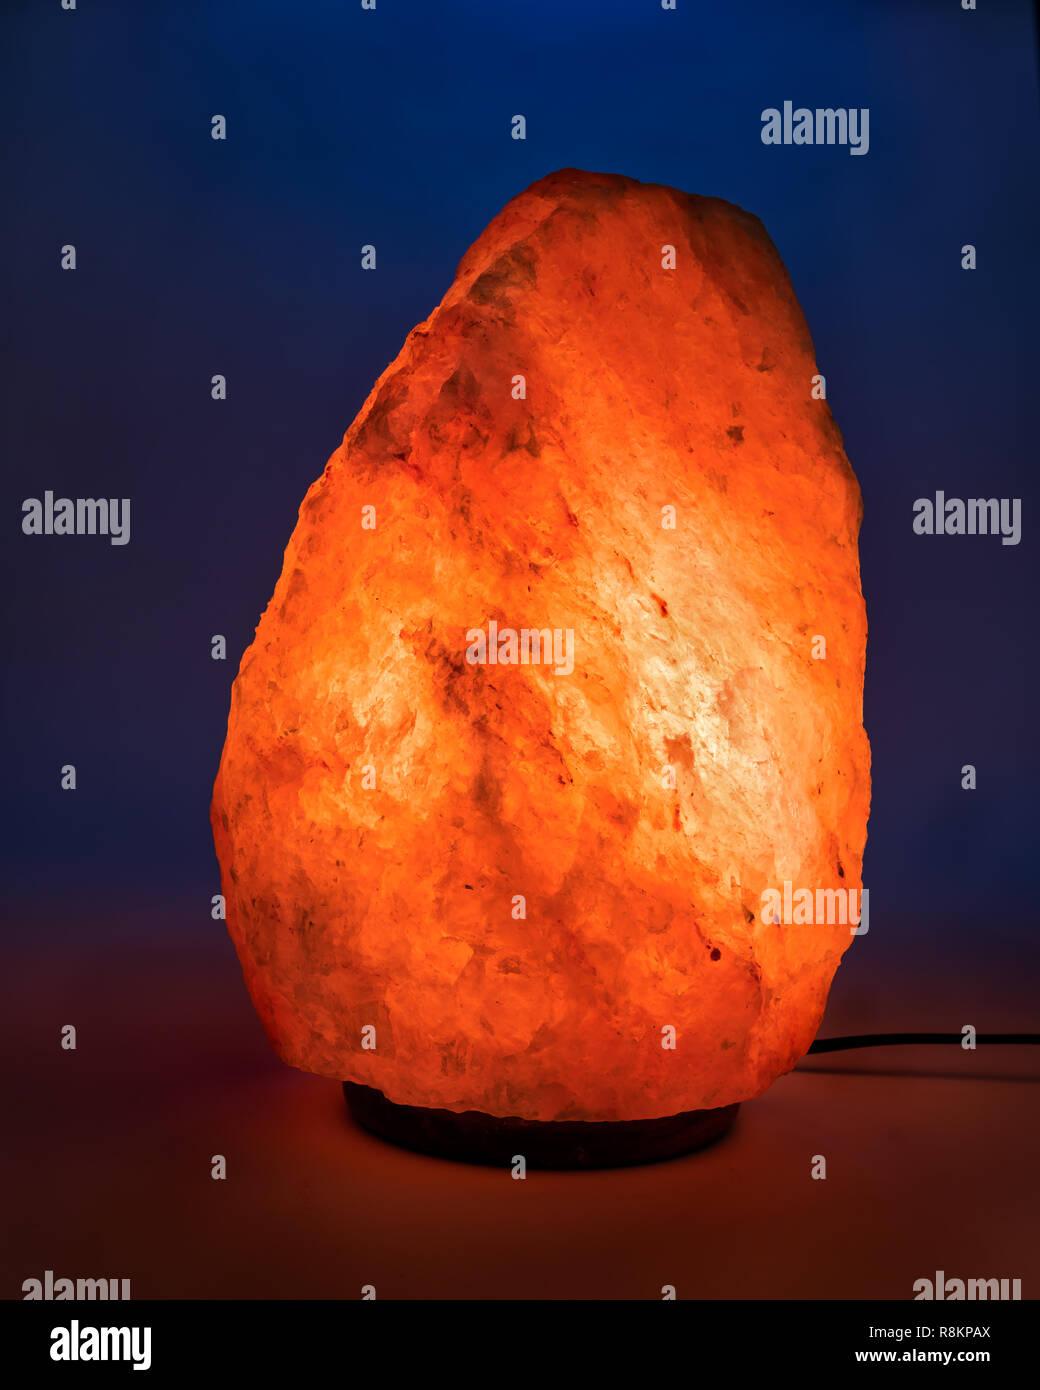 Large Himalayan Salt Lamp Glowing Against Plain Blue